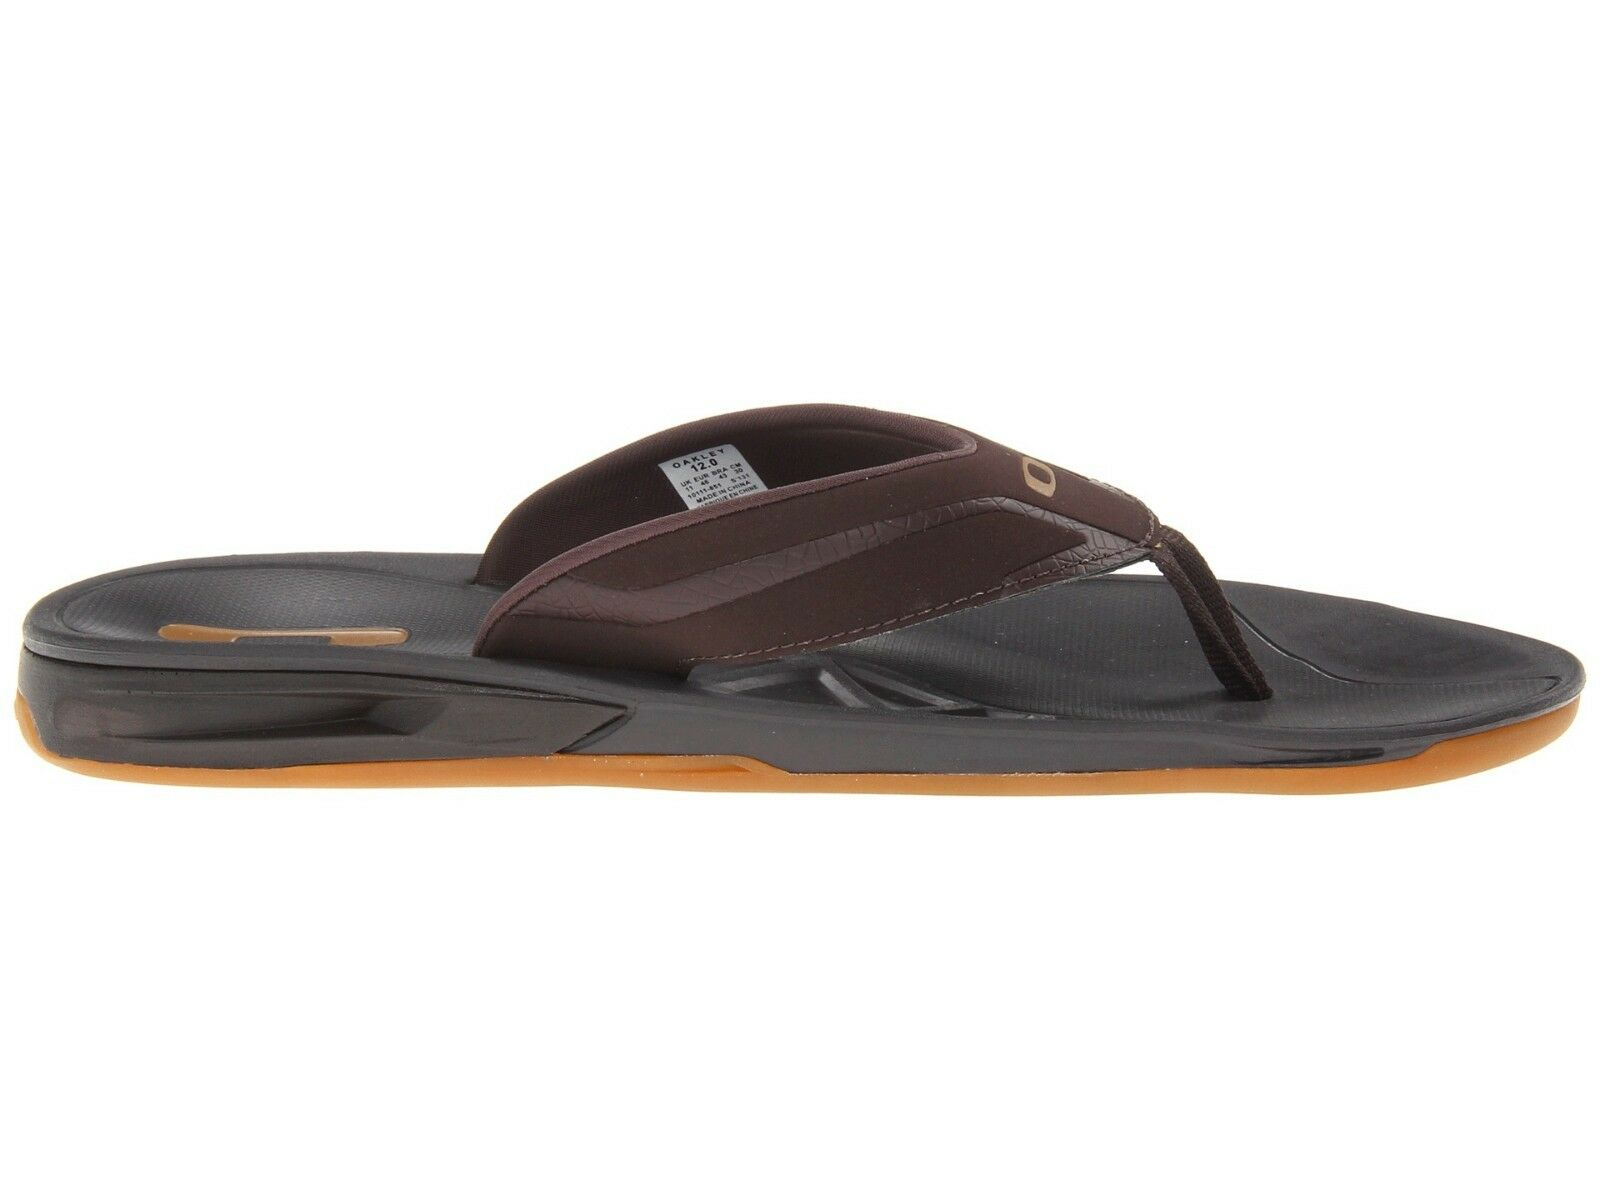 a1de4c8734da Oakley Mens HYPERCOIL Sandals Flip Flops 8-14 Brown 9 for sale online